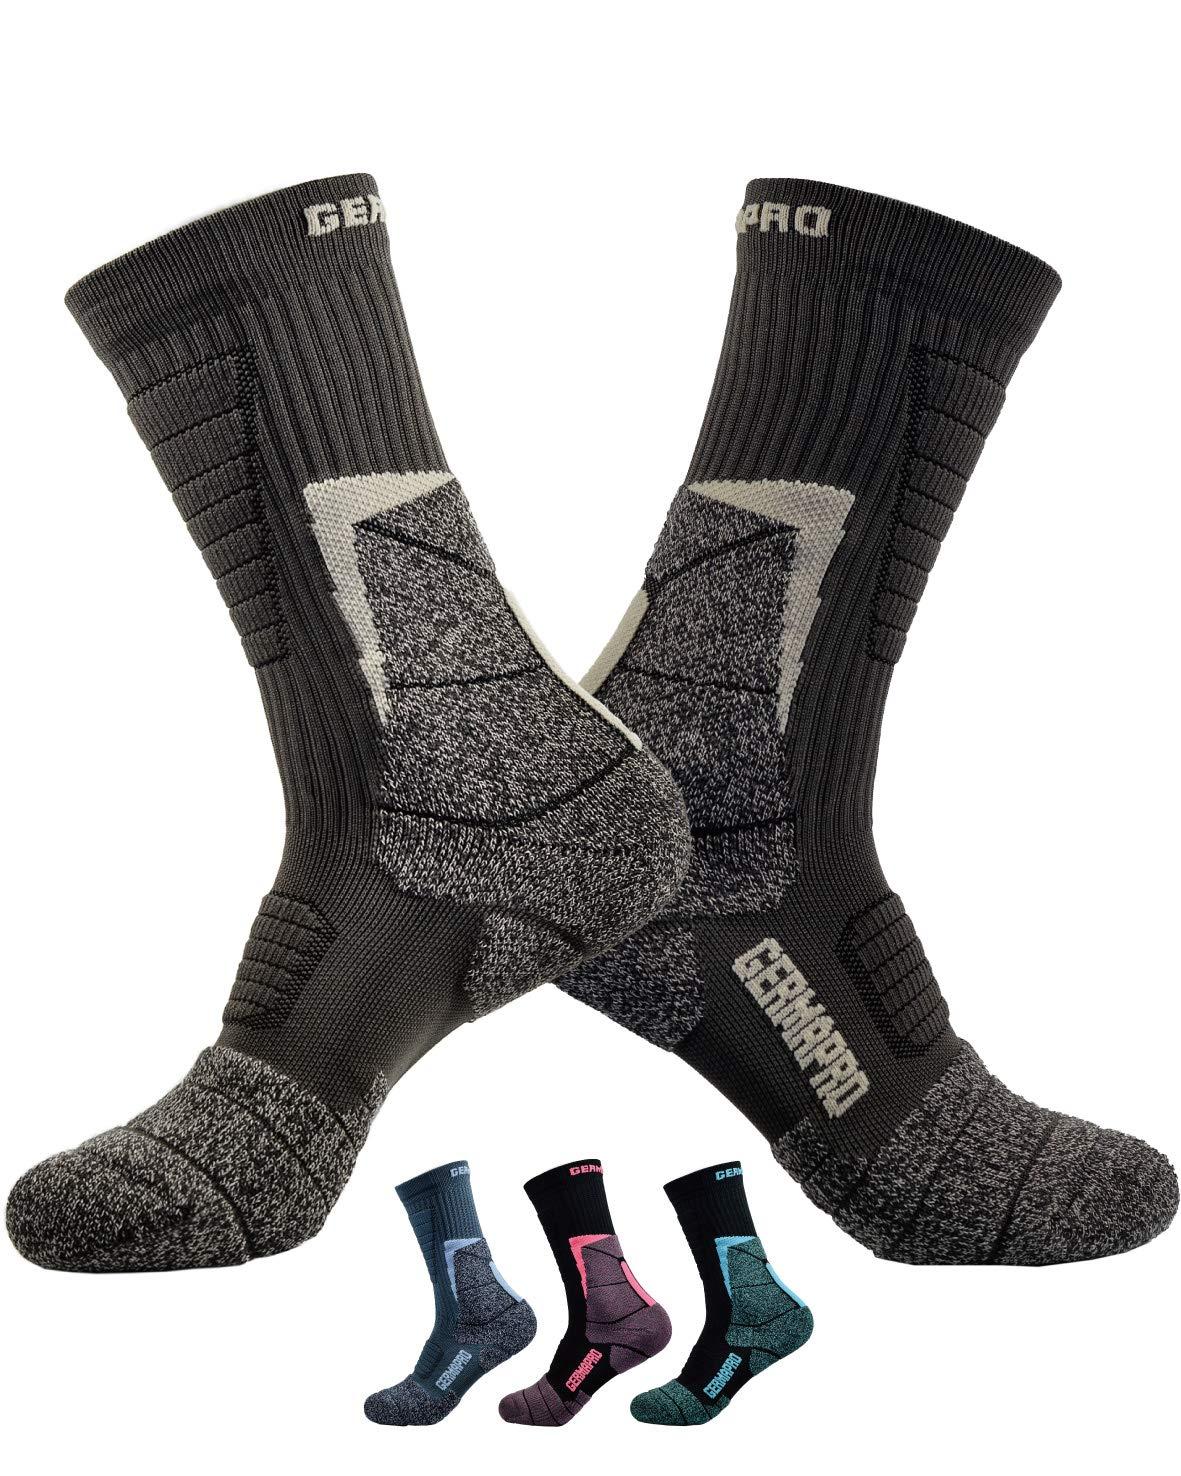 Mens Hiking Socks Outdoor Boot Work Socks w/Anti-Odor-Blister Moisture Wicking Germanium & Coolmax All Season 2 pairs by GermaPro